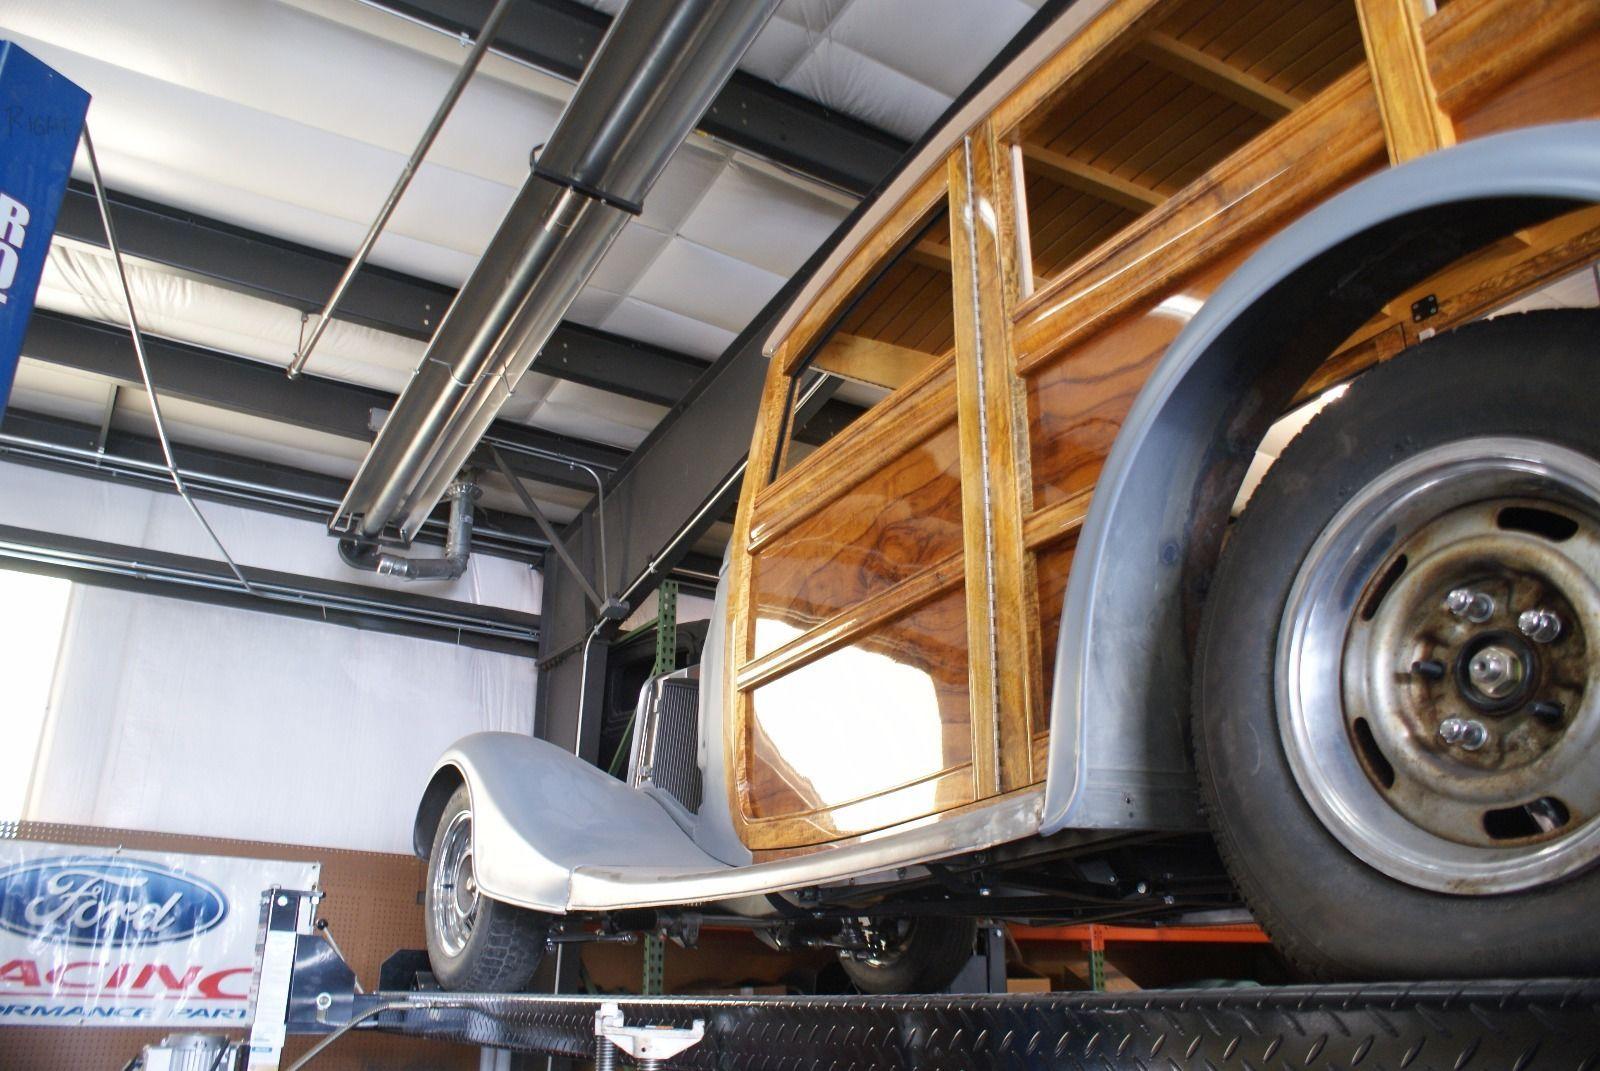 US $75,000.00 Remanufactured in eBay Motors, Parts & Accessories ...